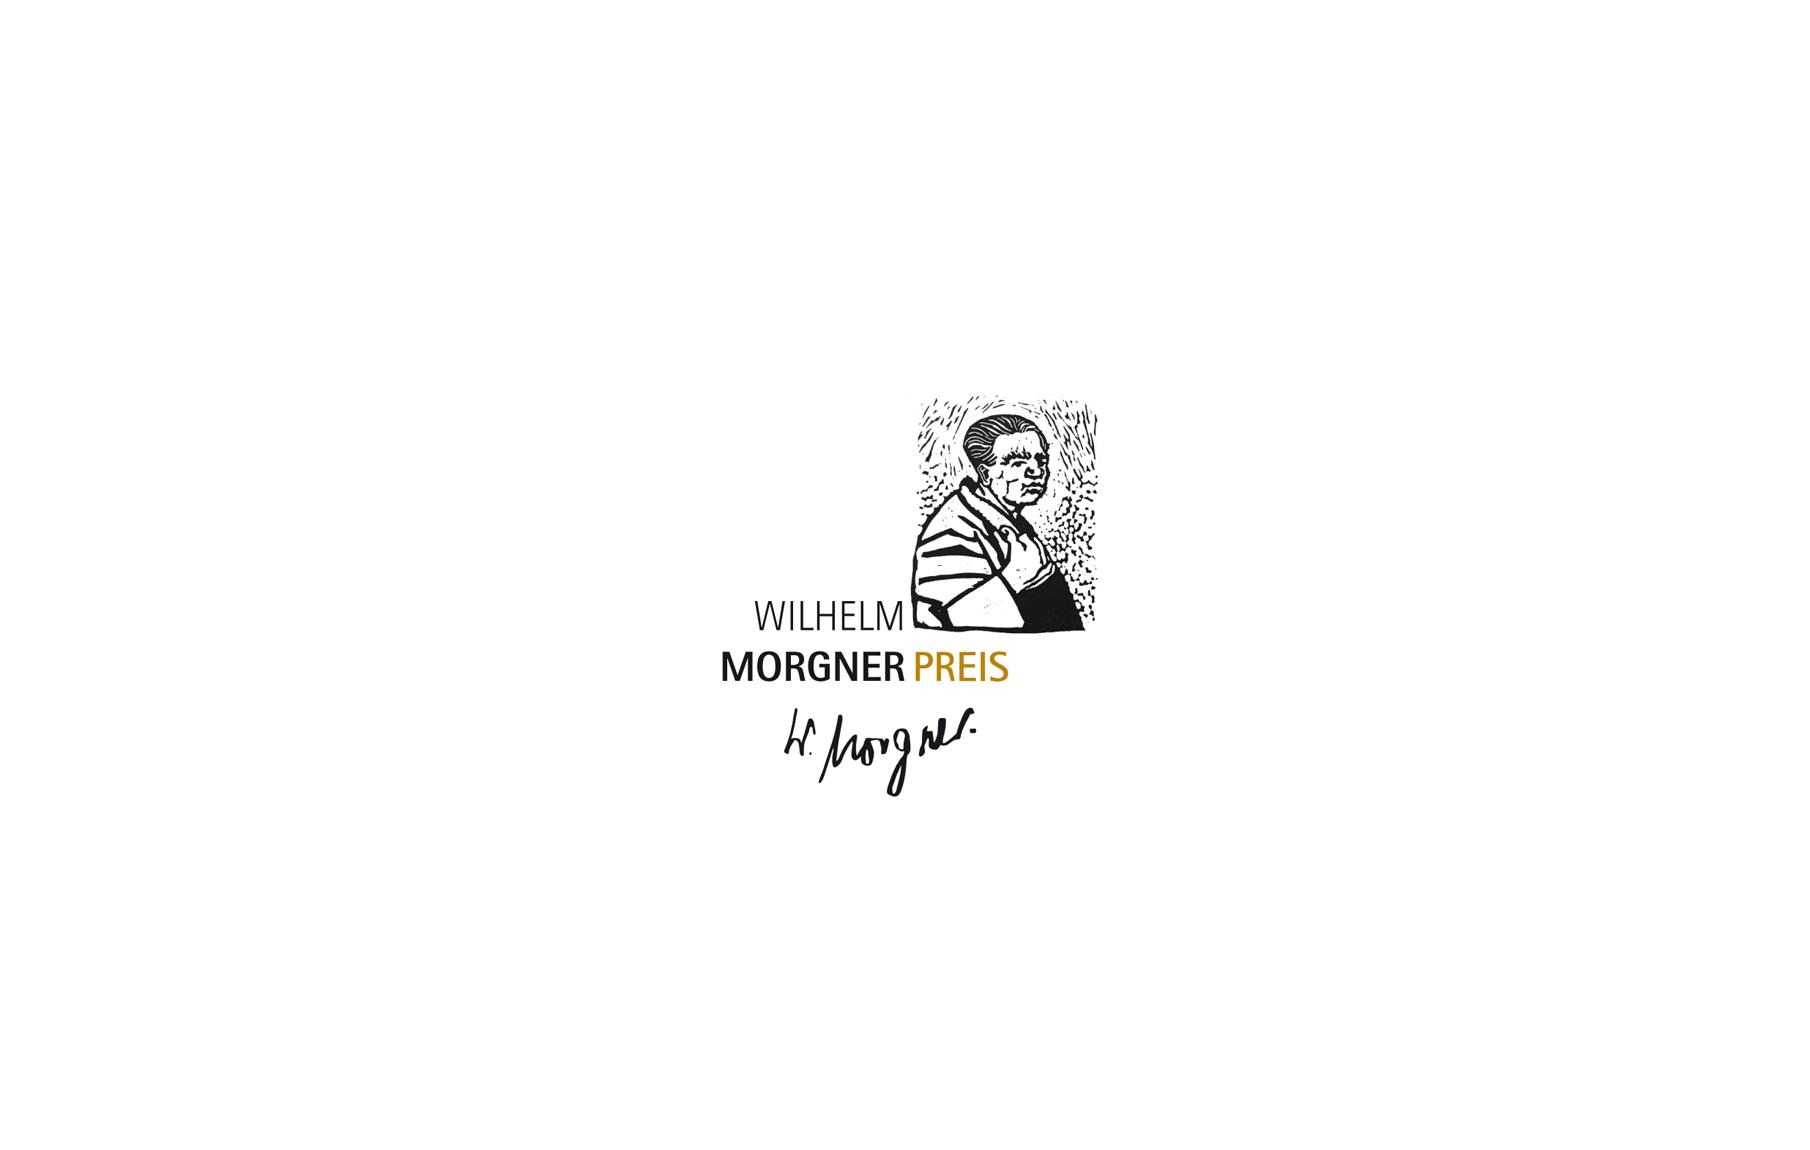 Wilhelm_Morgner_Preis